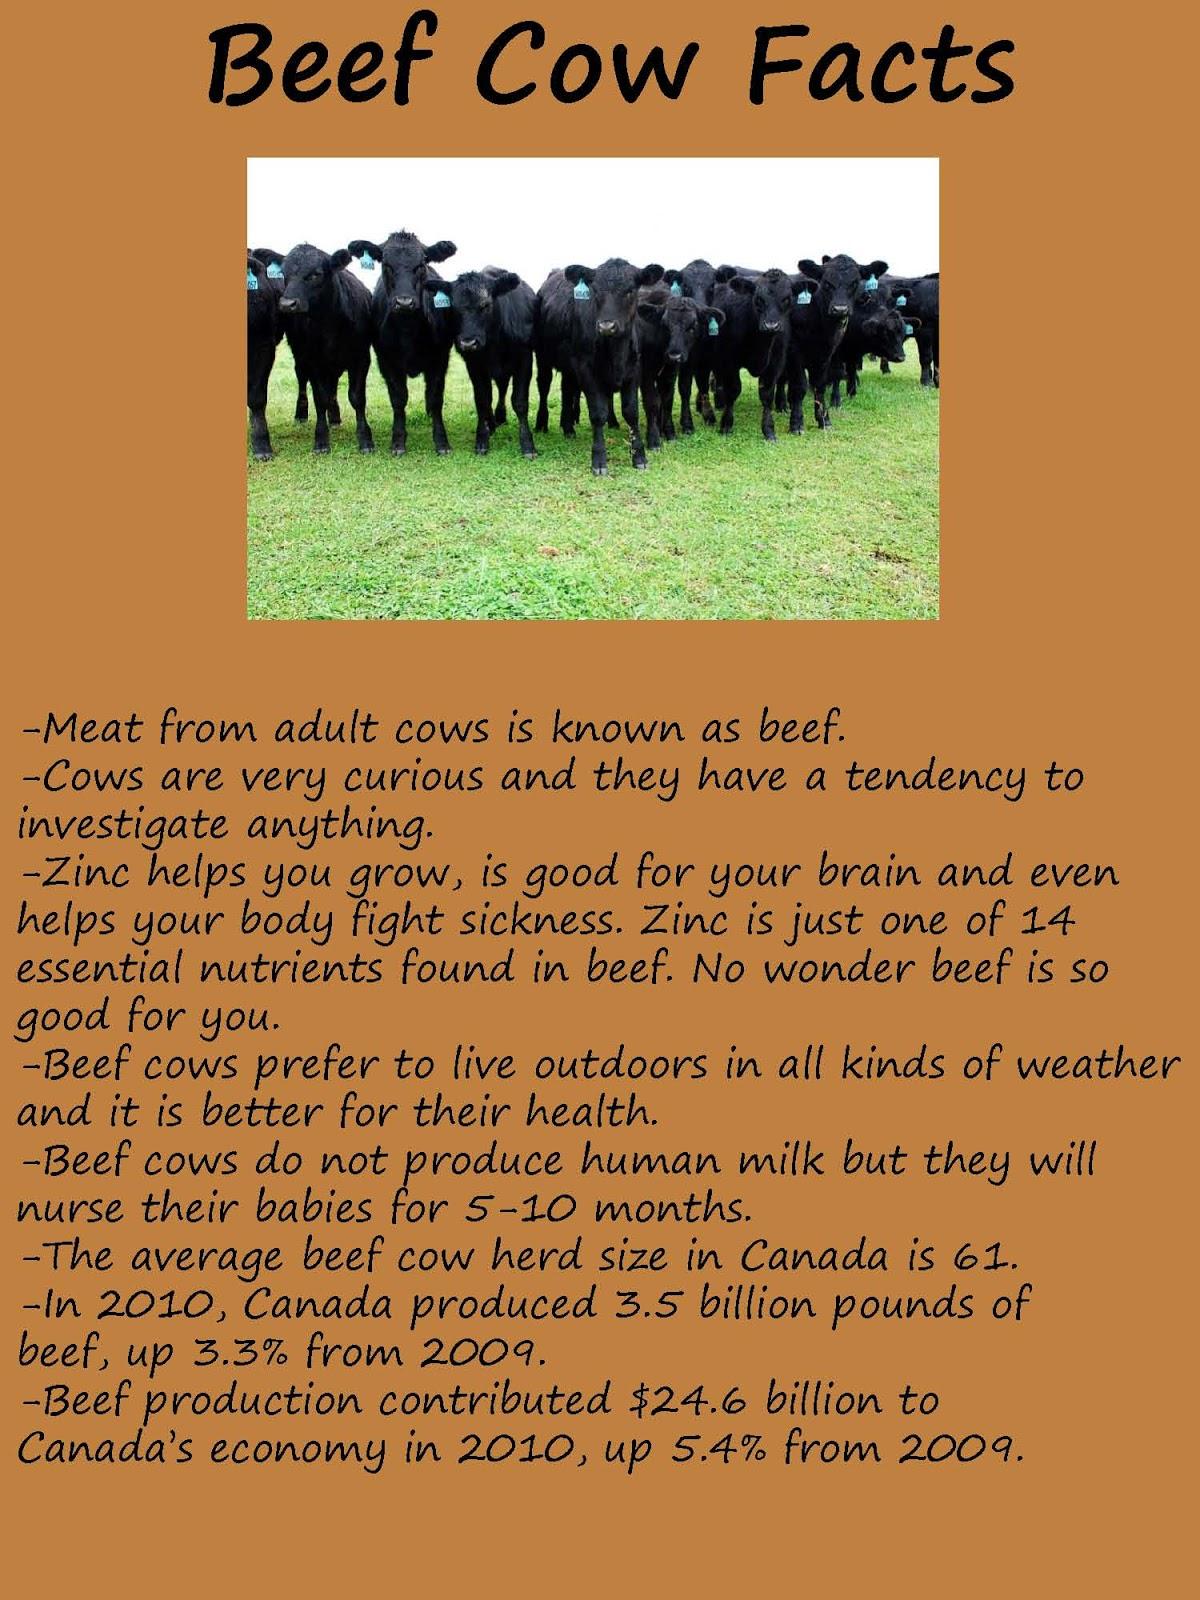 Optimist Club Of Norwich Amp District Corn Maze Farm Facts